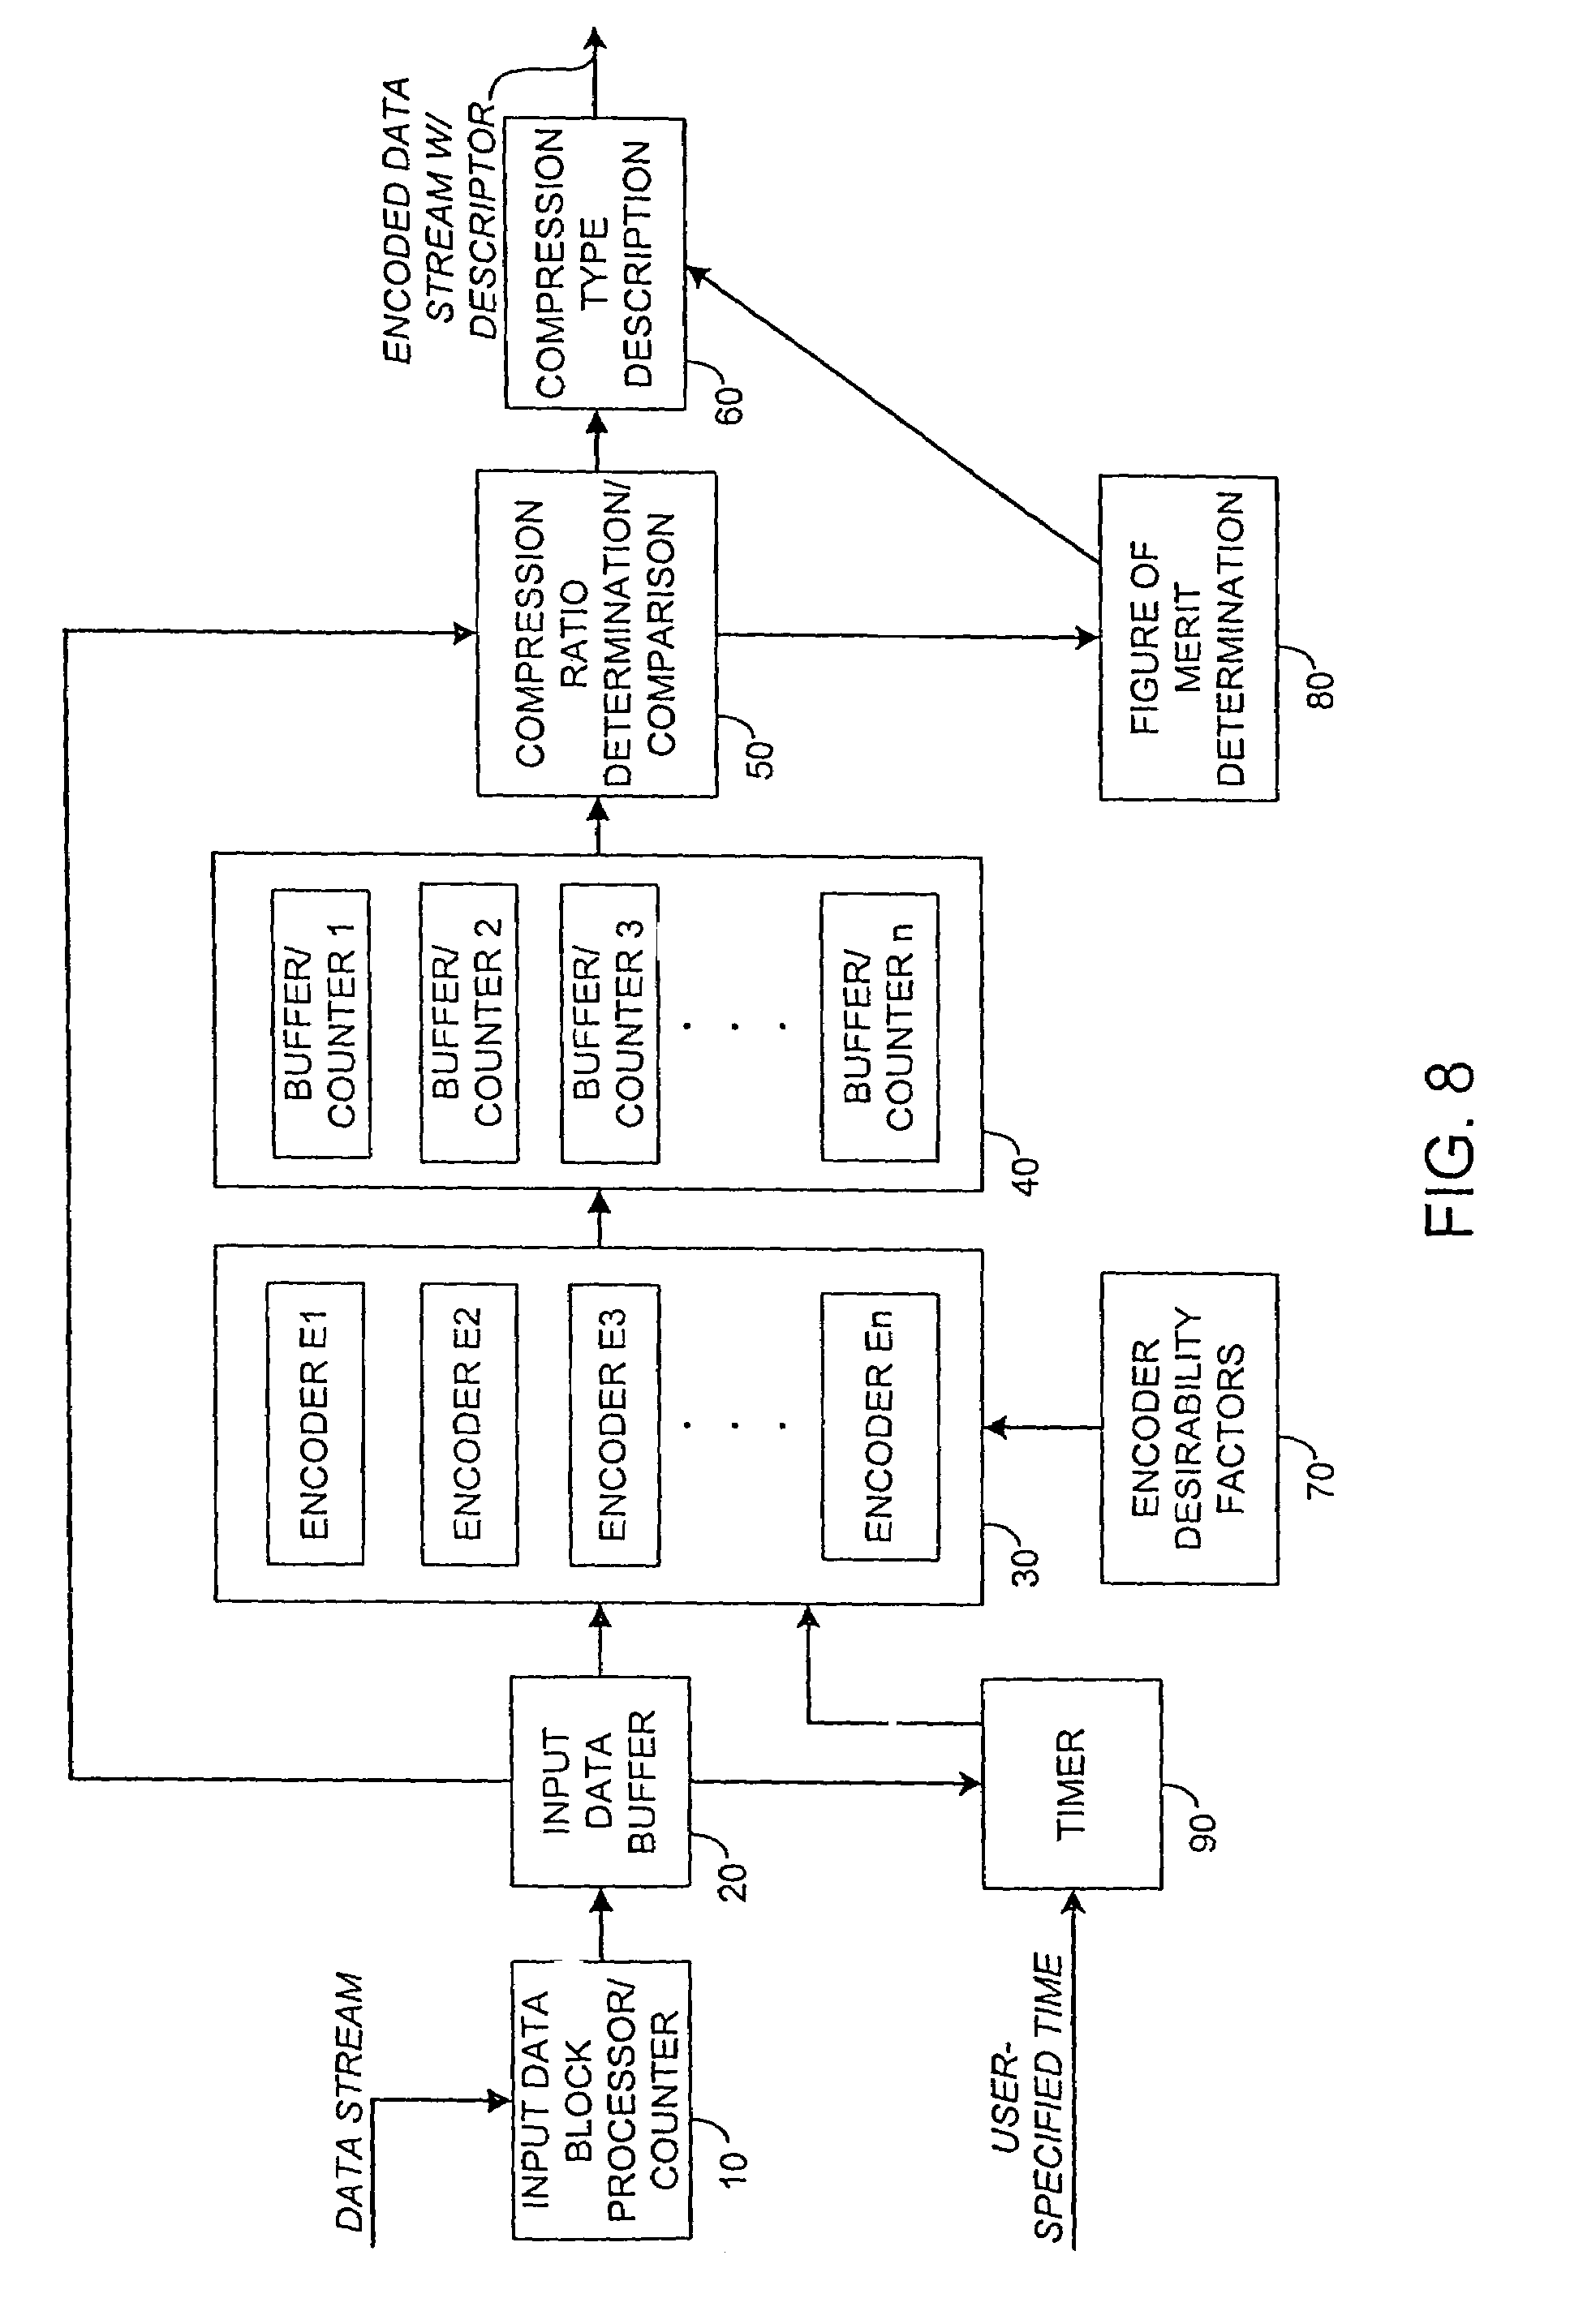 Patent US 7,358,867 B2